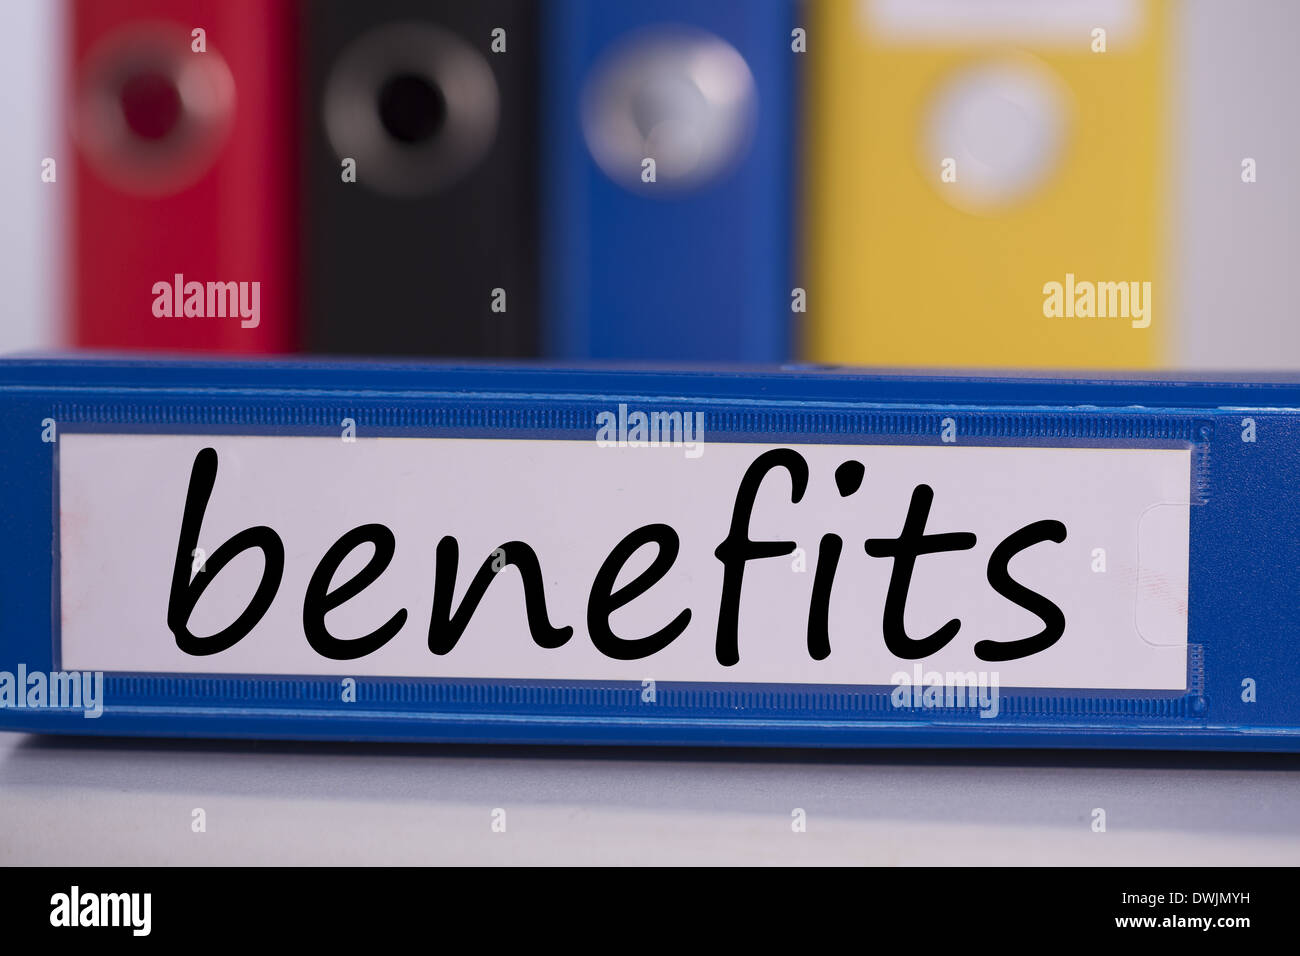 Benefits on blue business binder - Stock Image